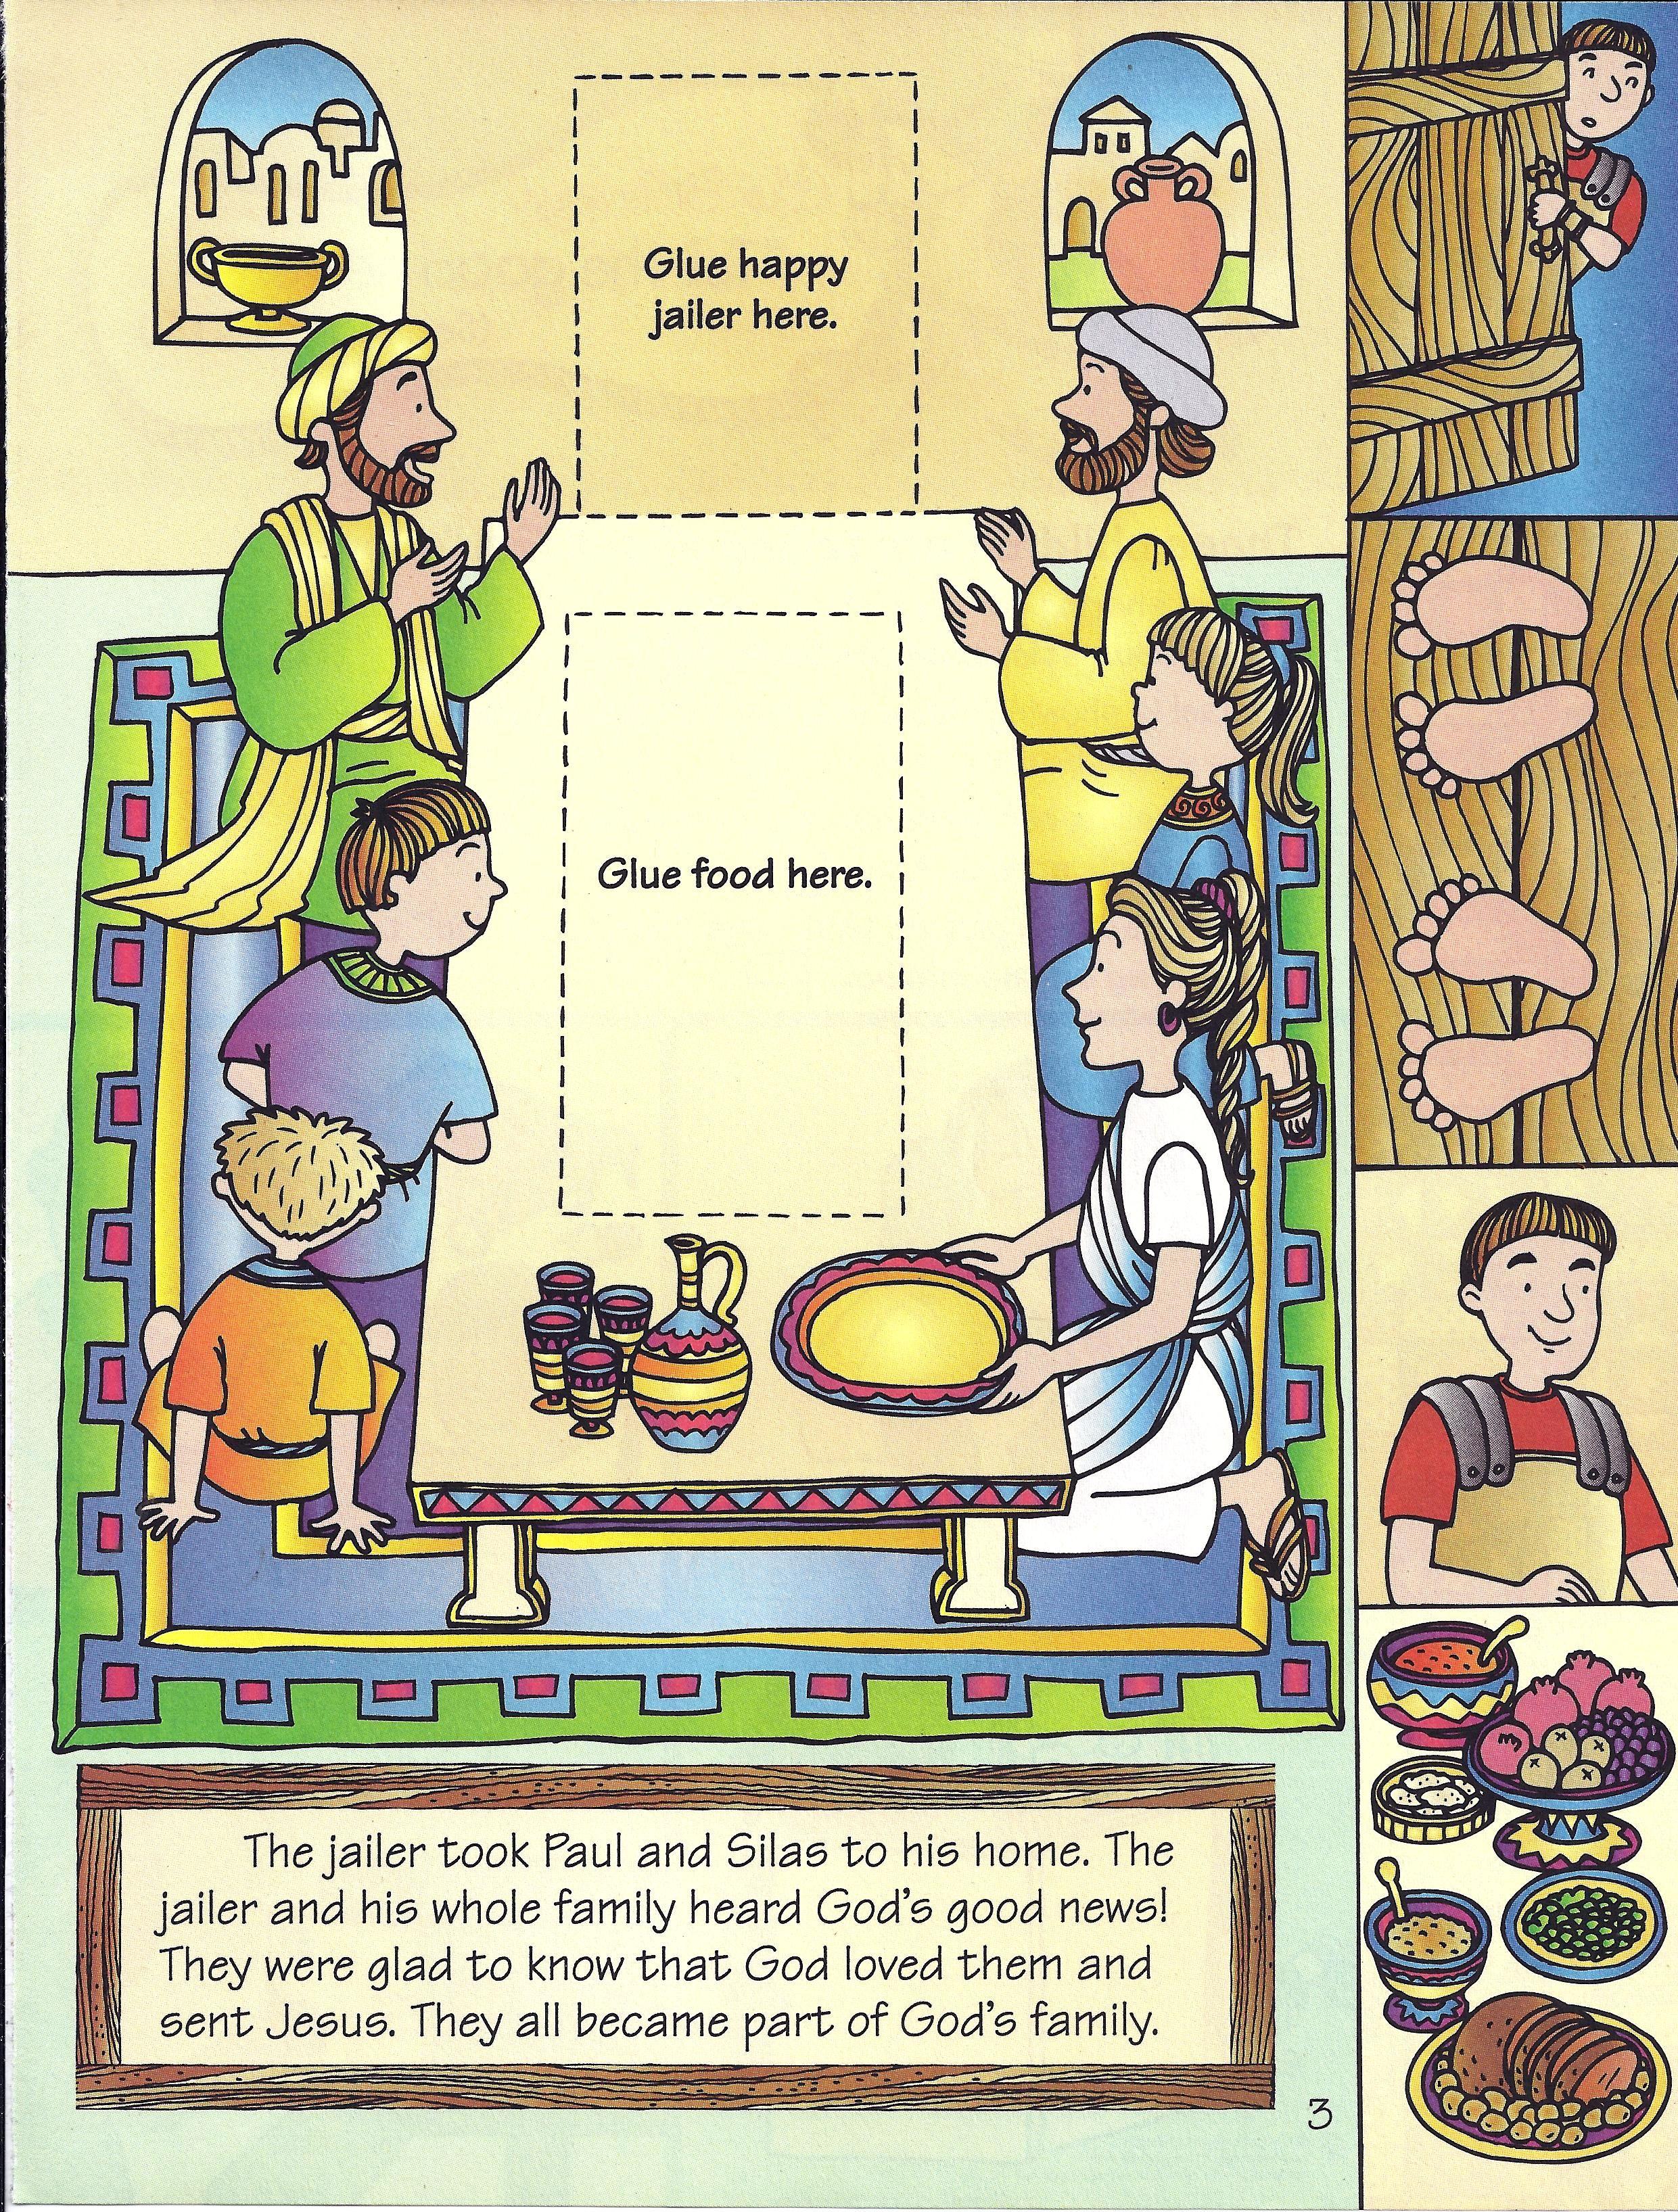 Paul and silas | Deciples | Pinterest | Sonntagsschule und Geschichte